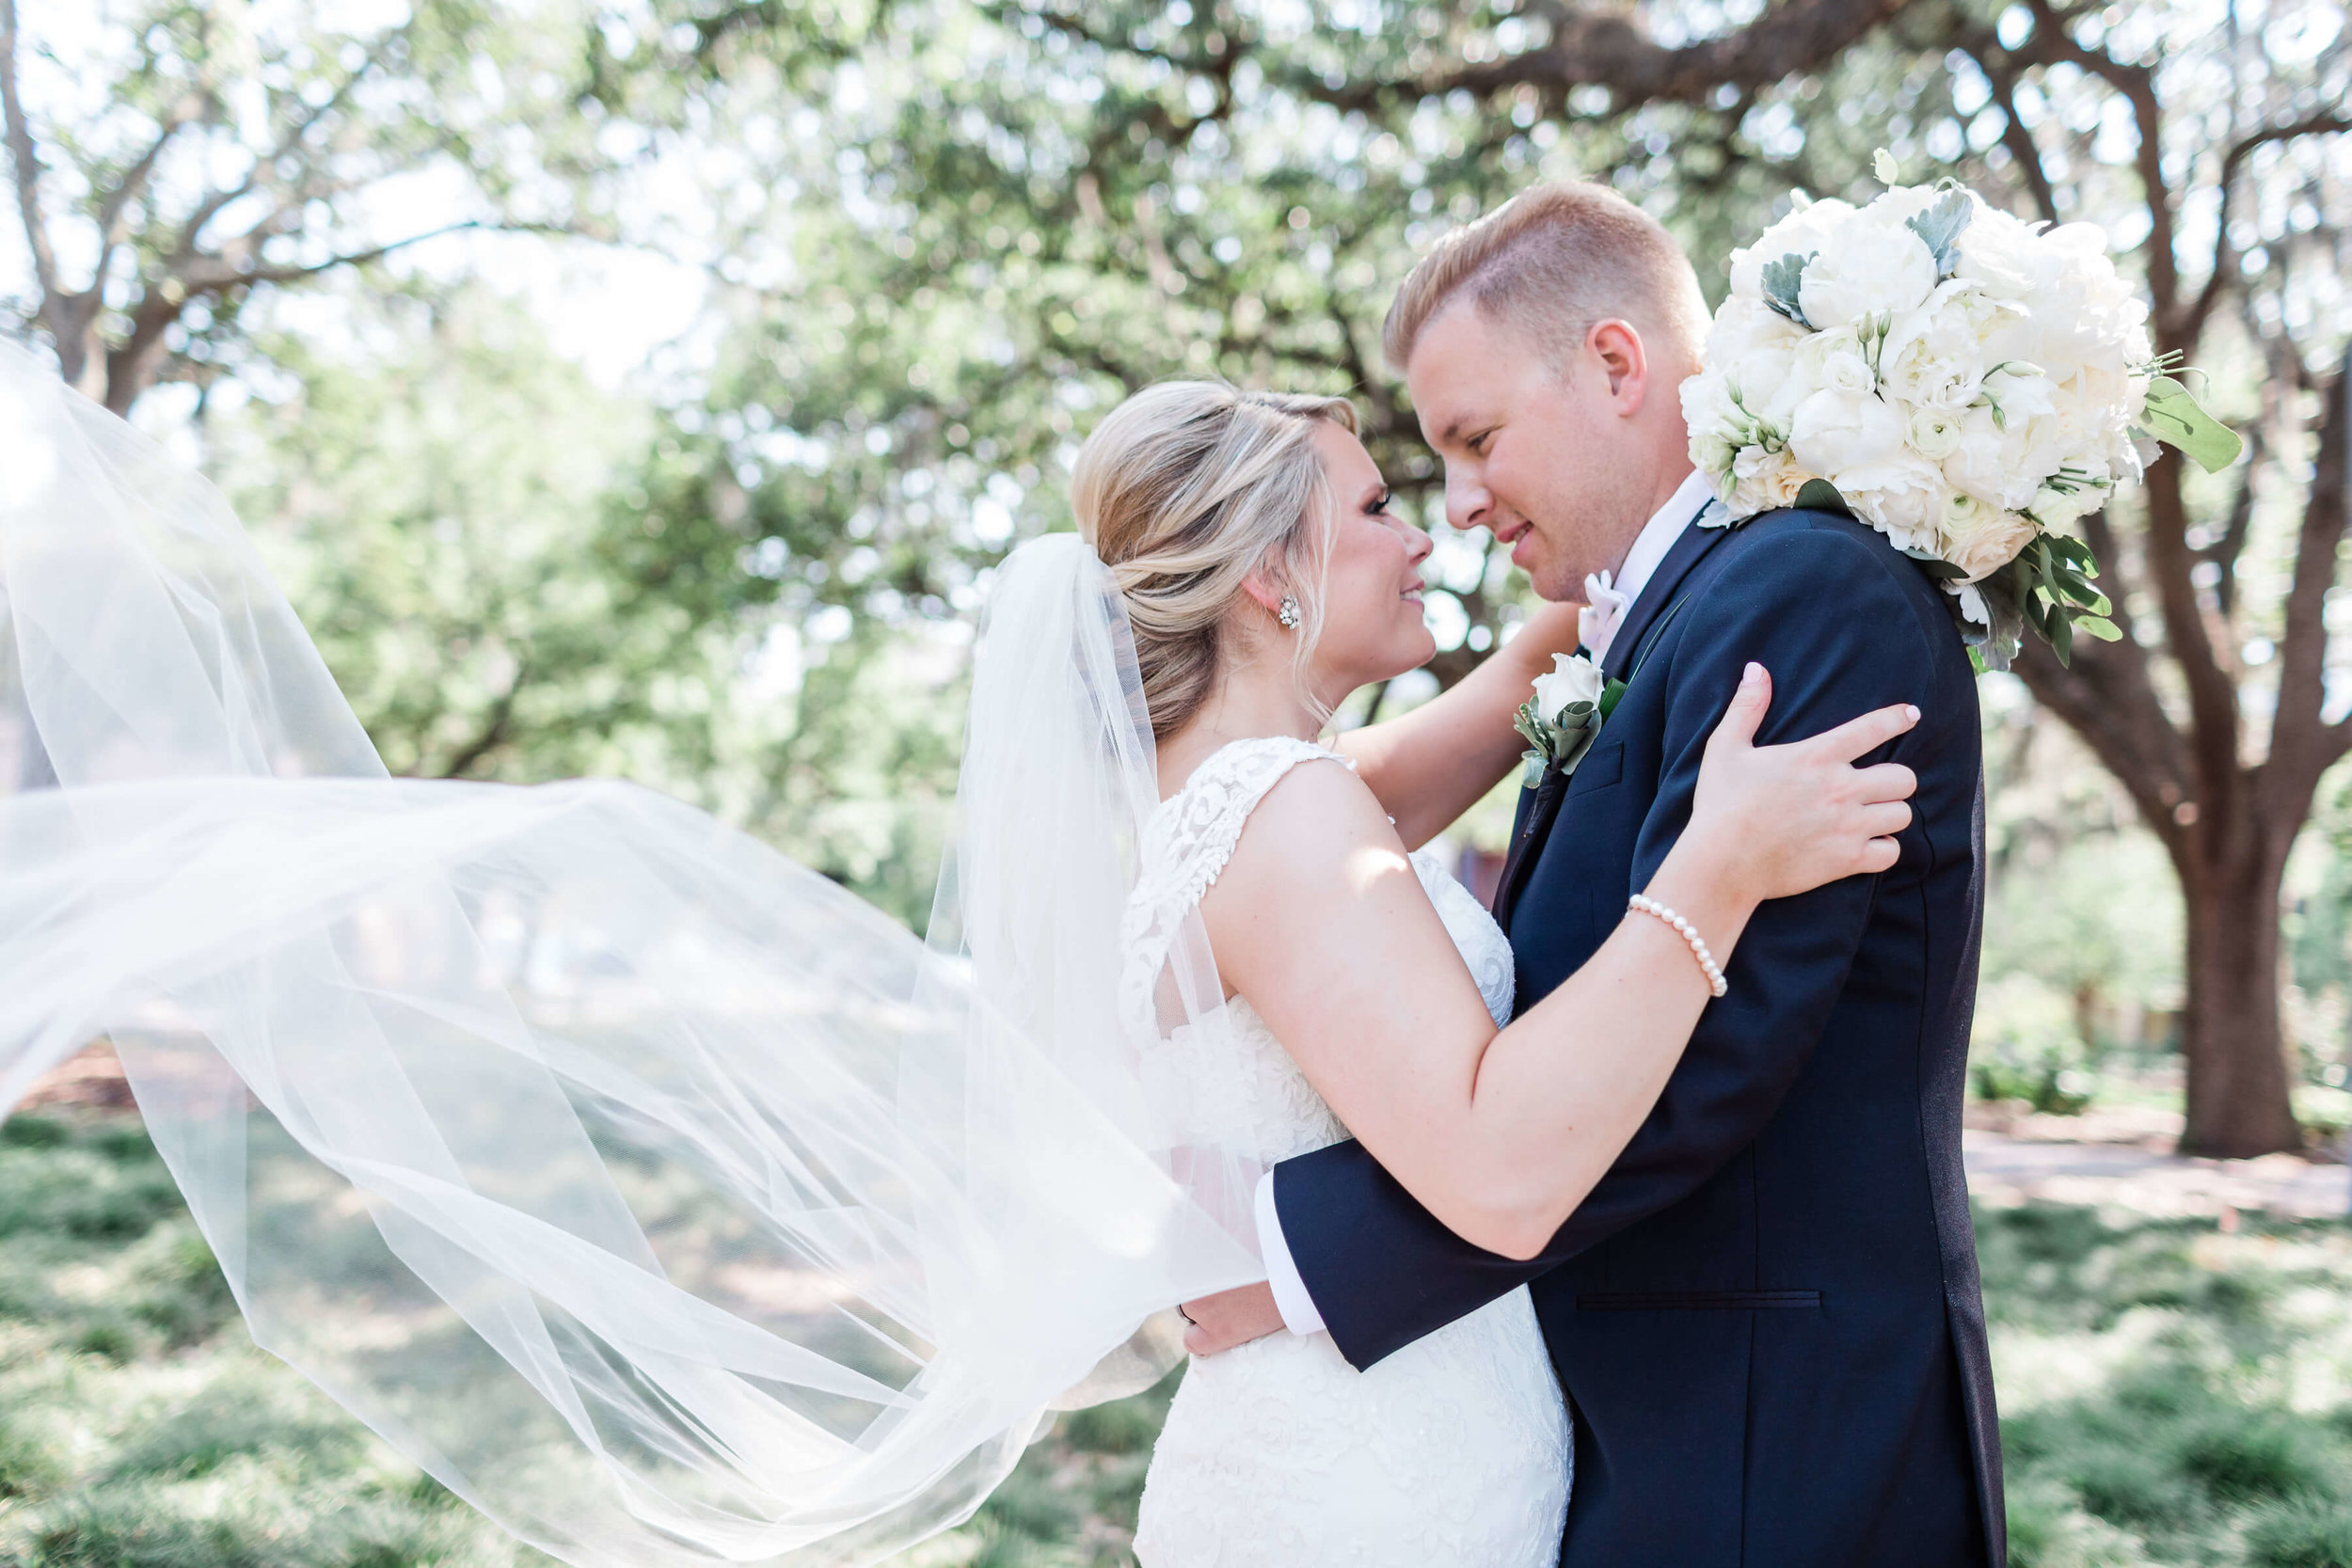 Meghan Evan - Apt B Photography - Savannah Wedding Photographer, savannah wedding